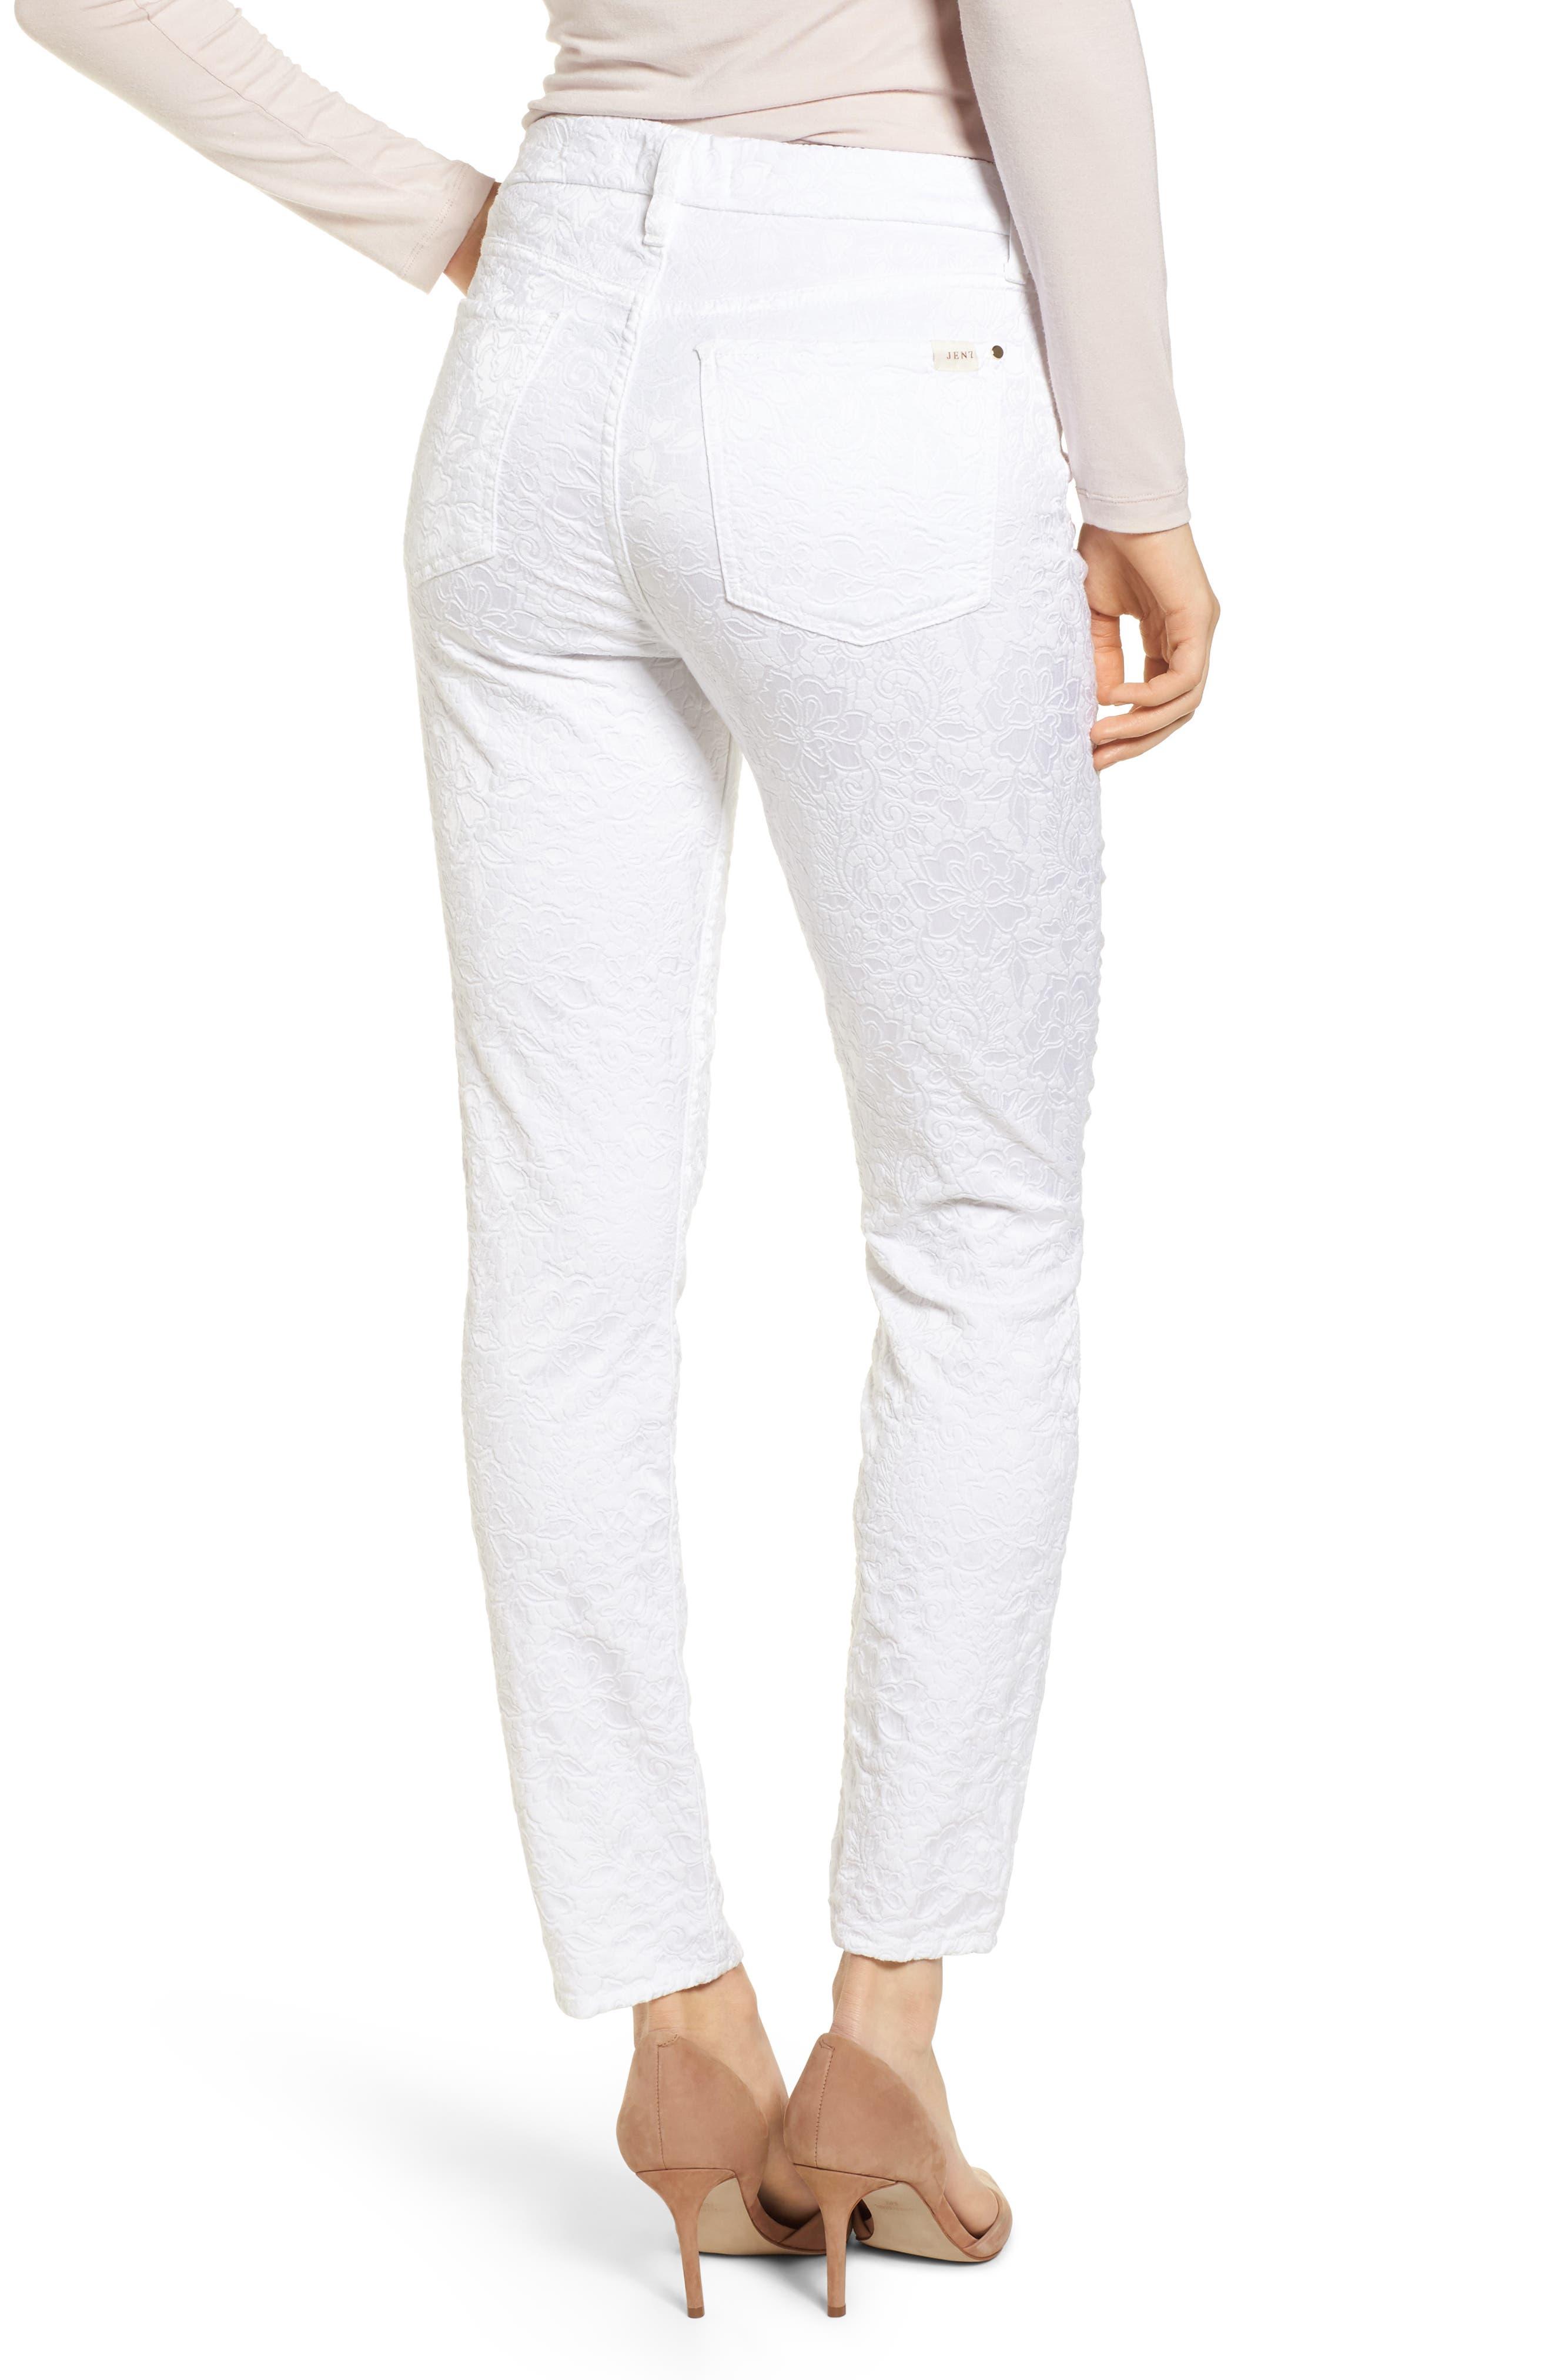 Jacquard Ankle Skinny Jeans,                             Alternate thumbnail 2, color,                             White